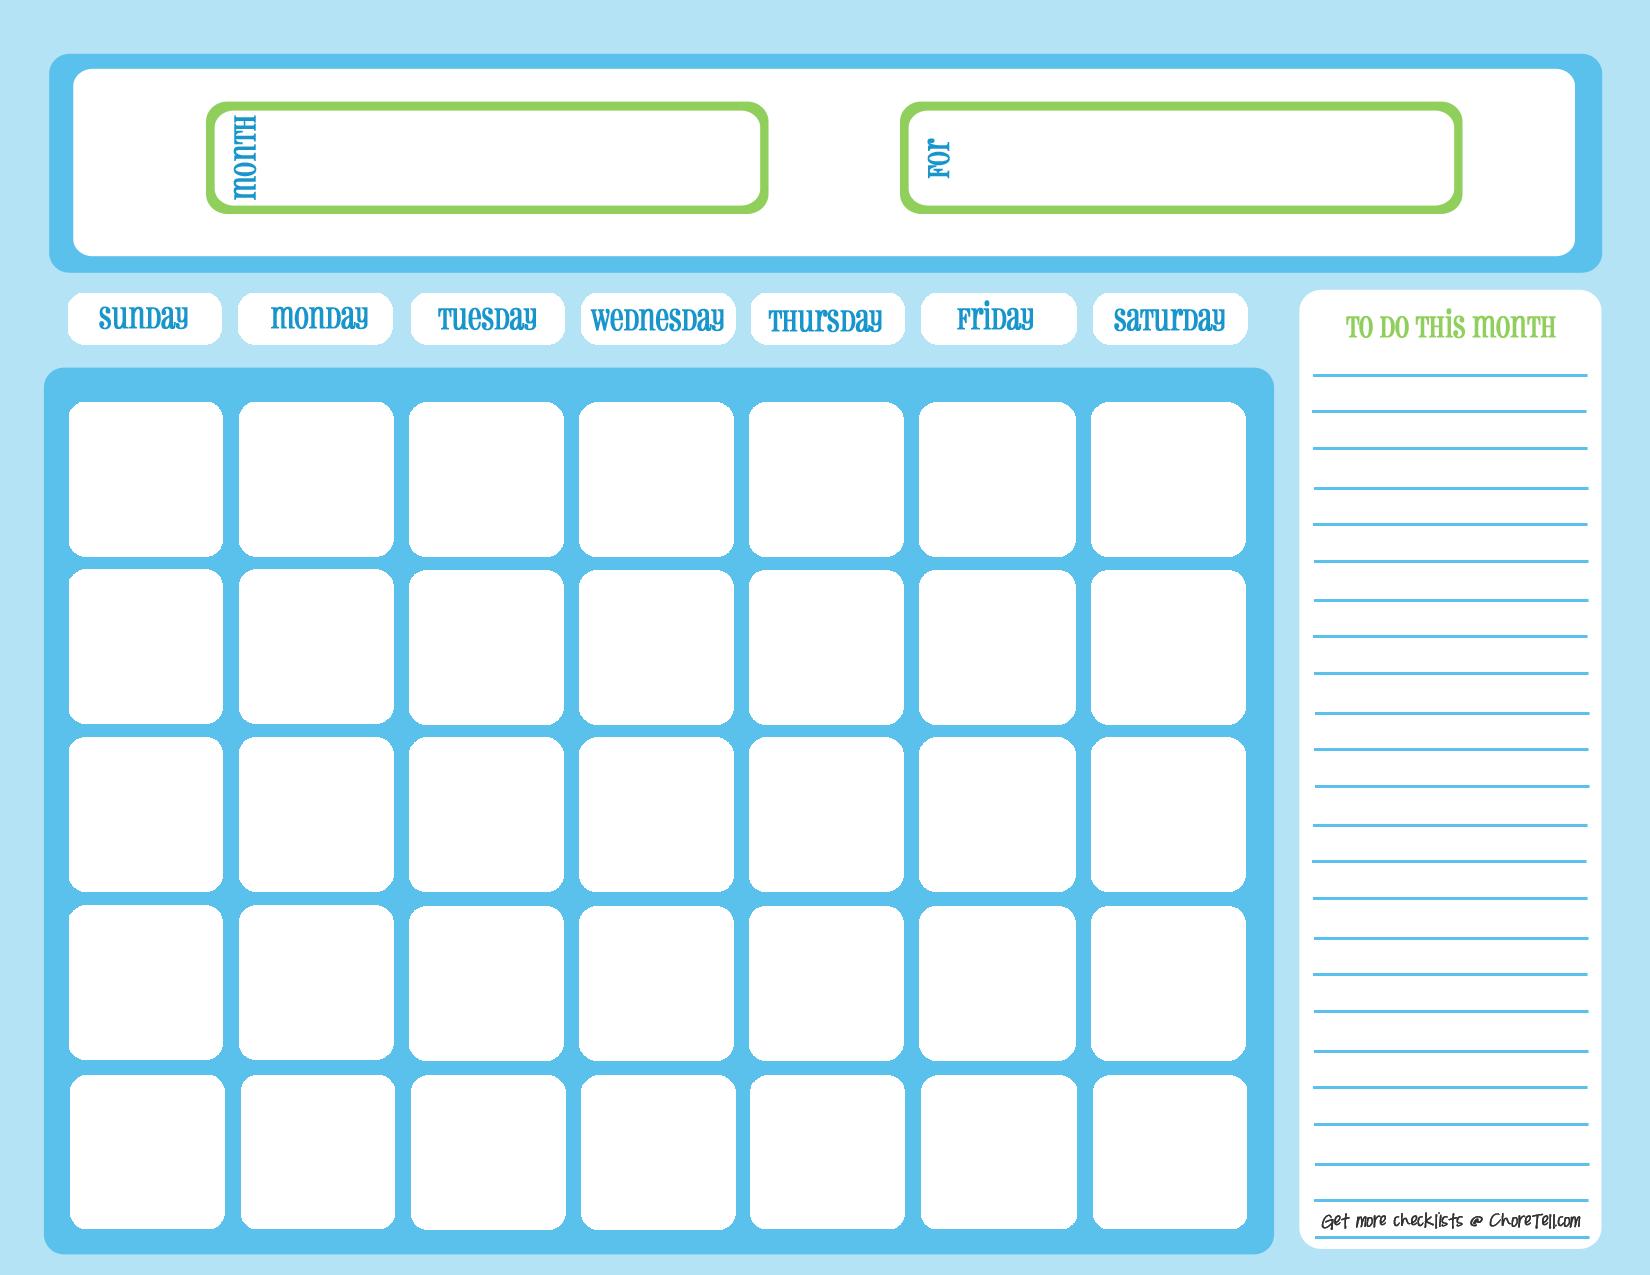 Blank Chore Calendar Blue On Light Blue Free Printable Downloads